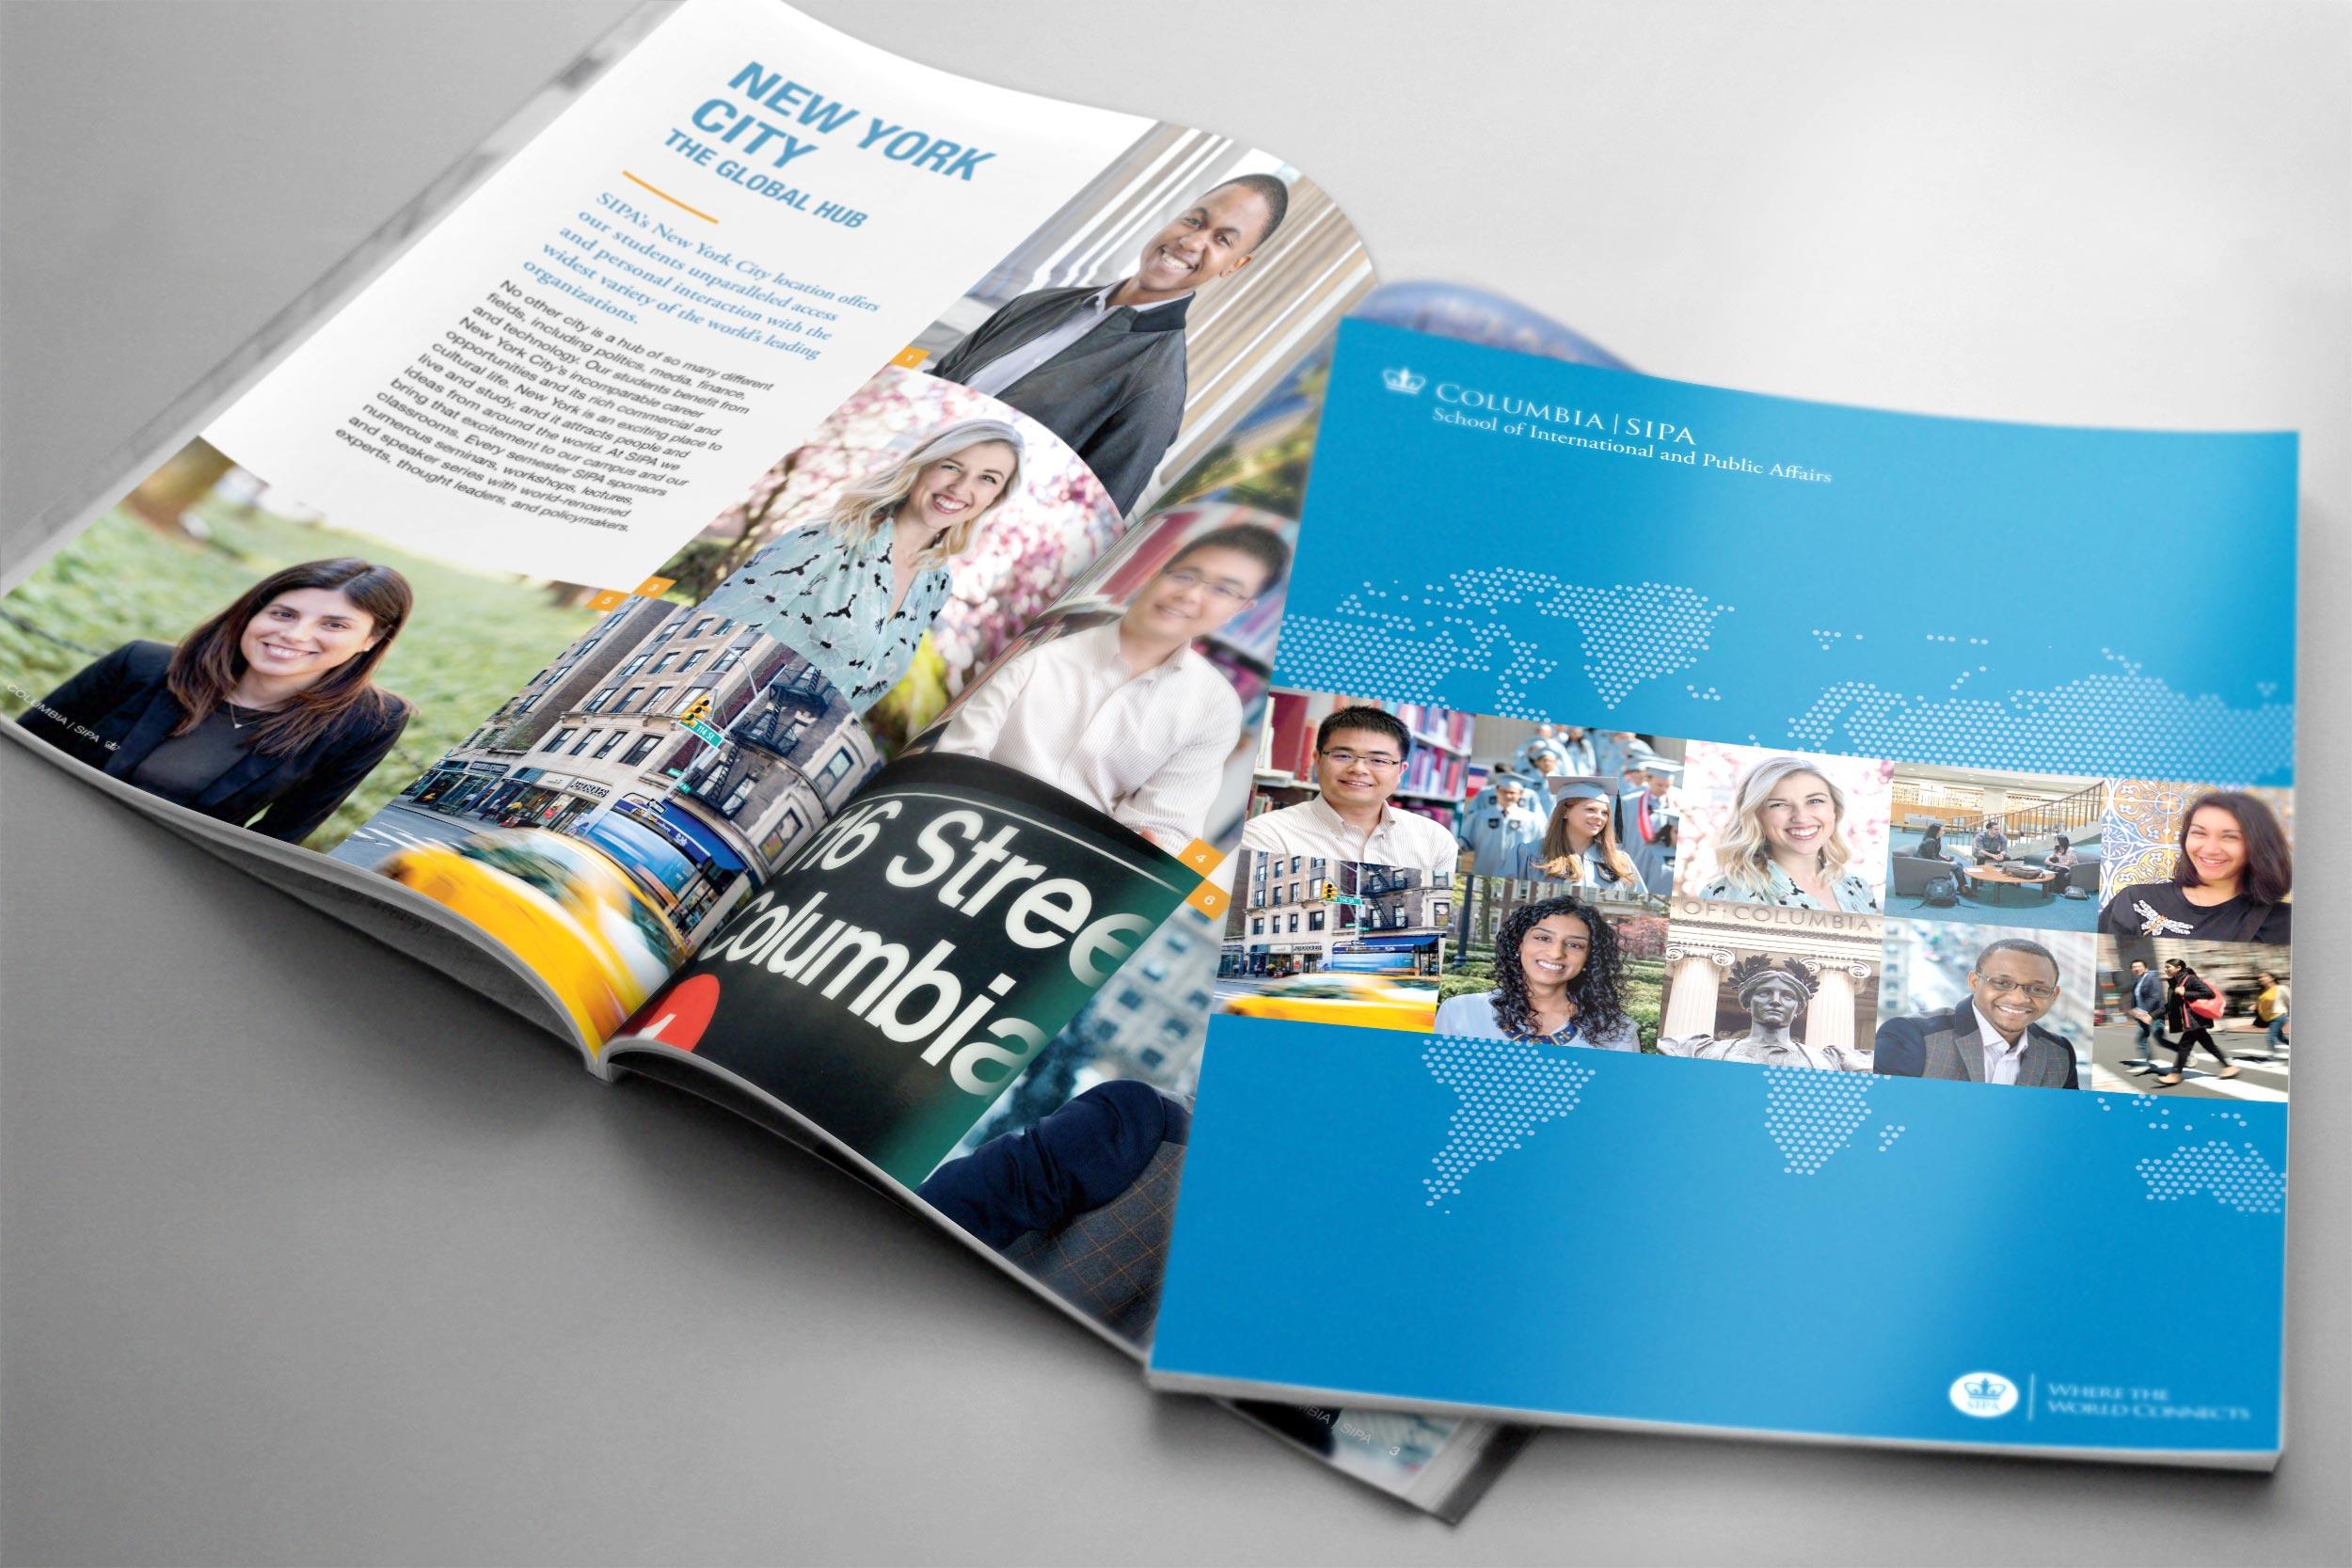 Columbia SIPA Admissions Brochure